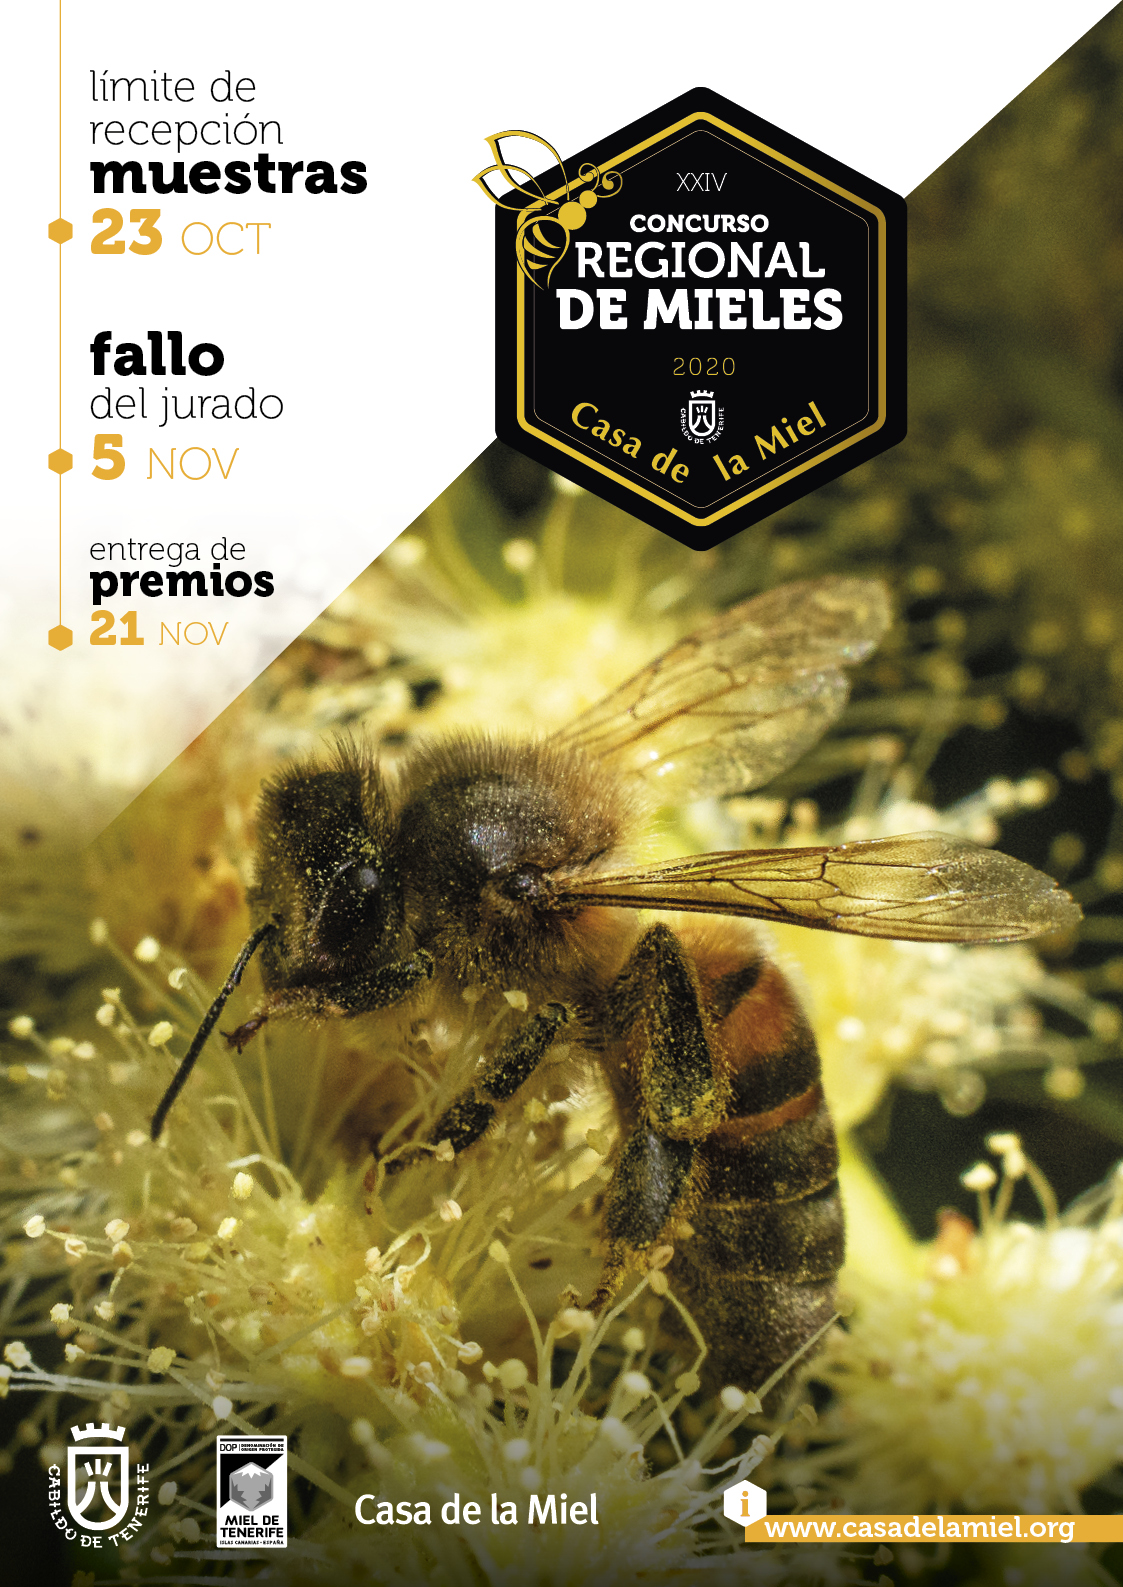 XXIV concurso de mieles CASA DE LA MIEL